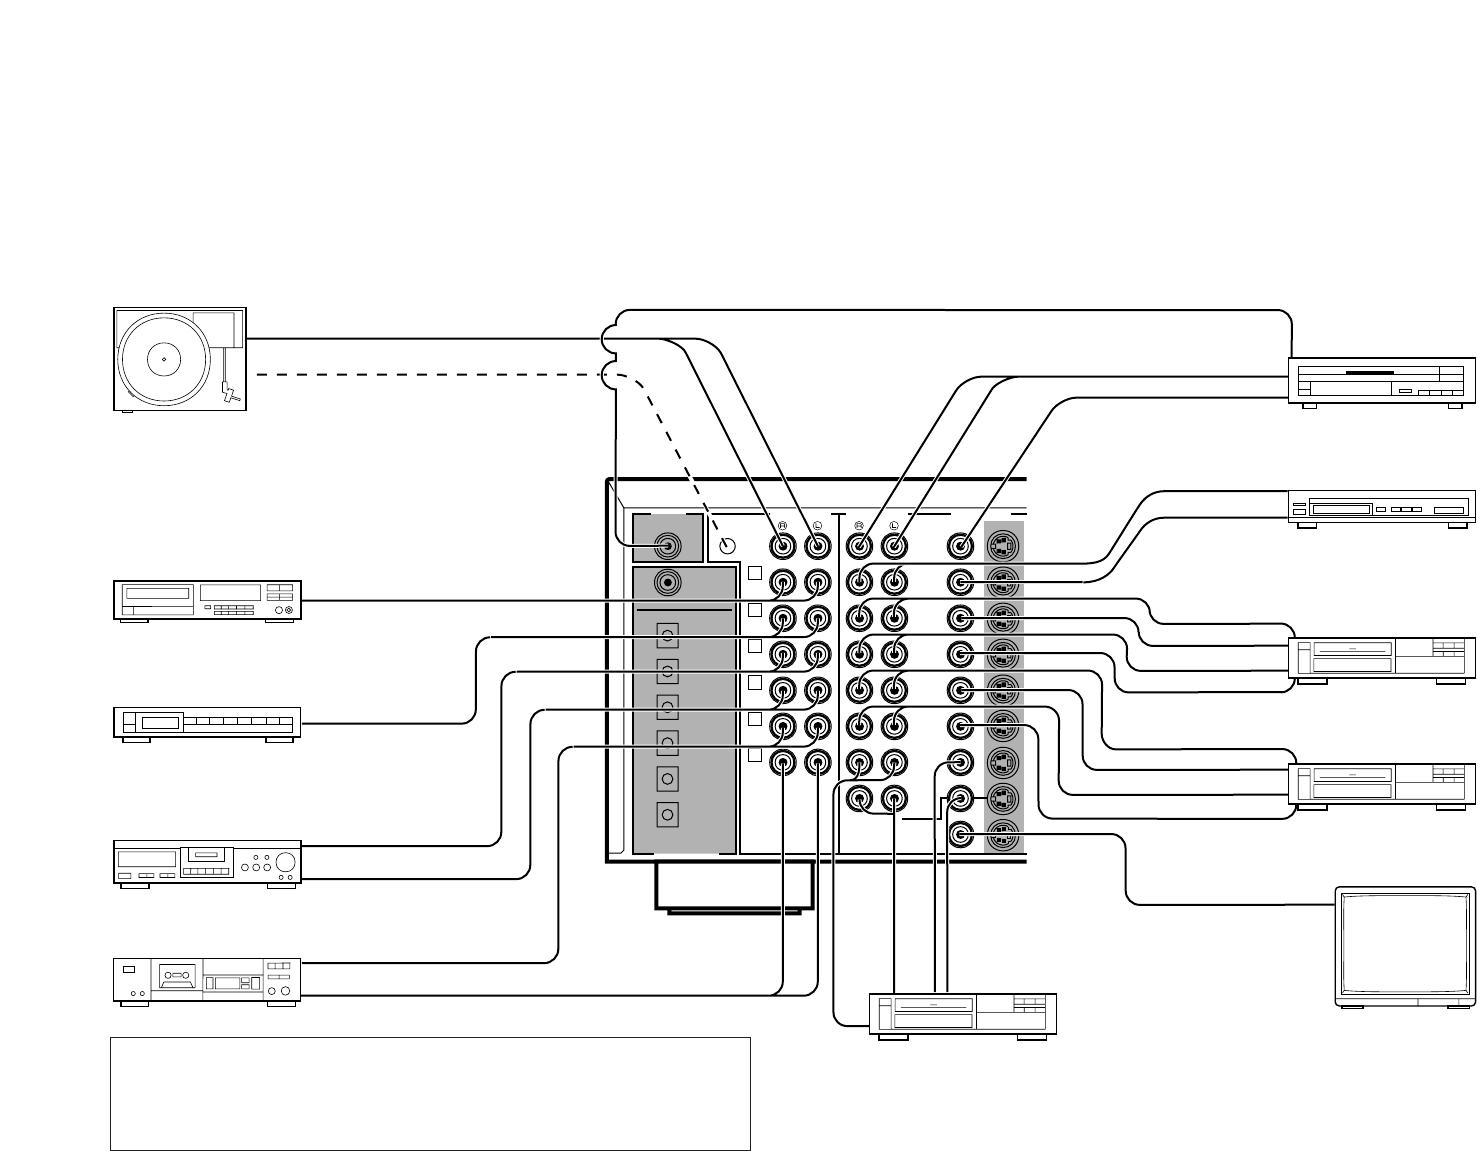 Yamaha Dsp A3090 Operation Manual E 1 (03/15/96)